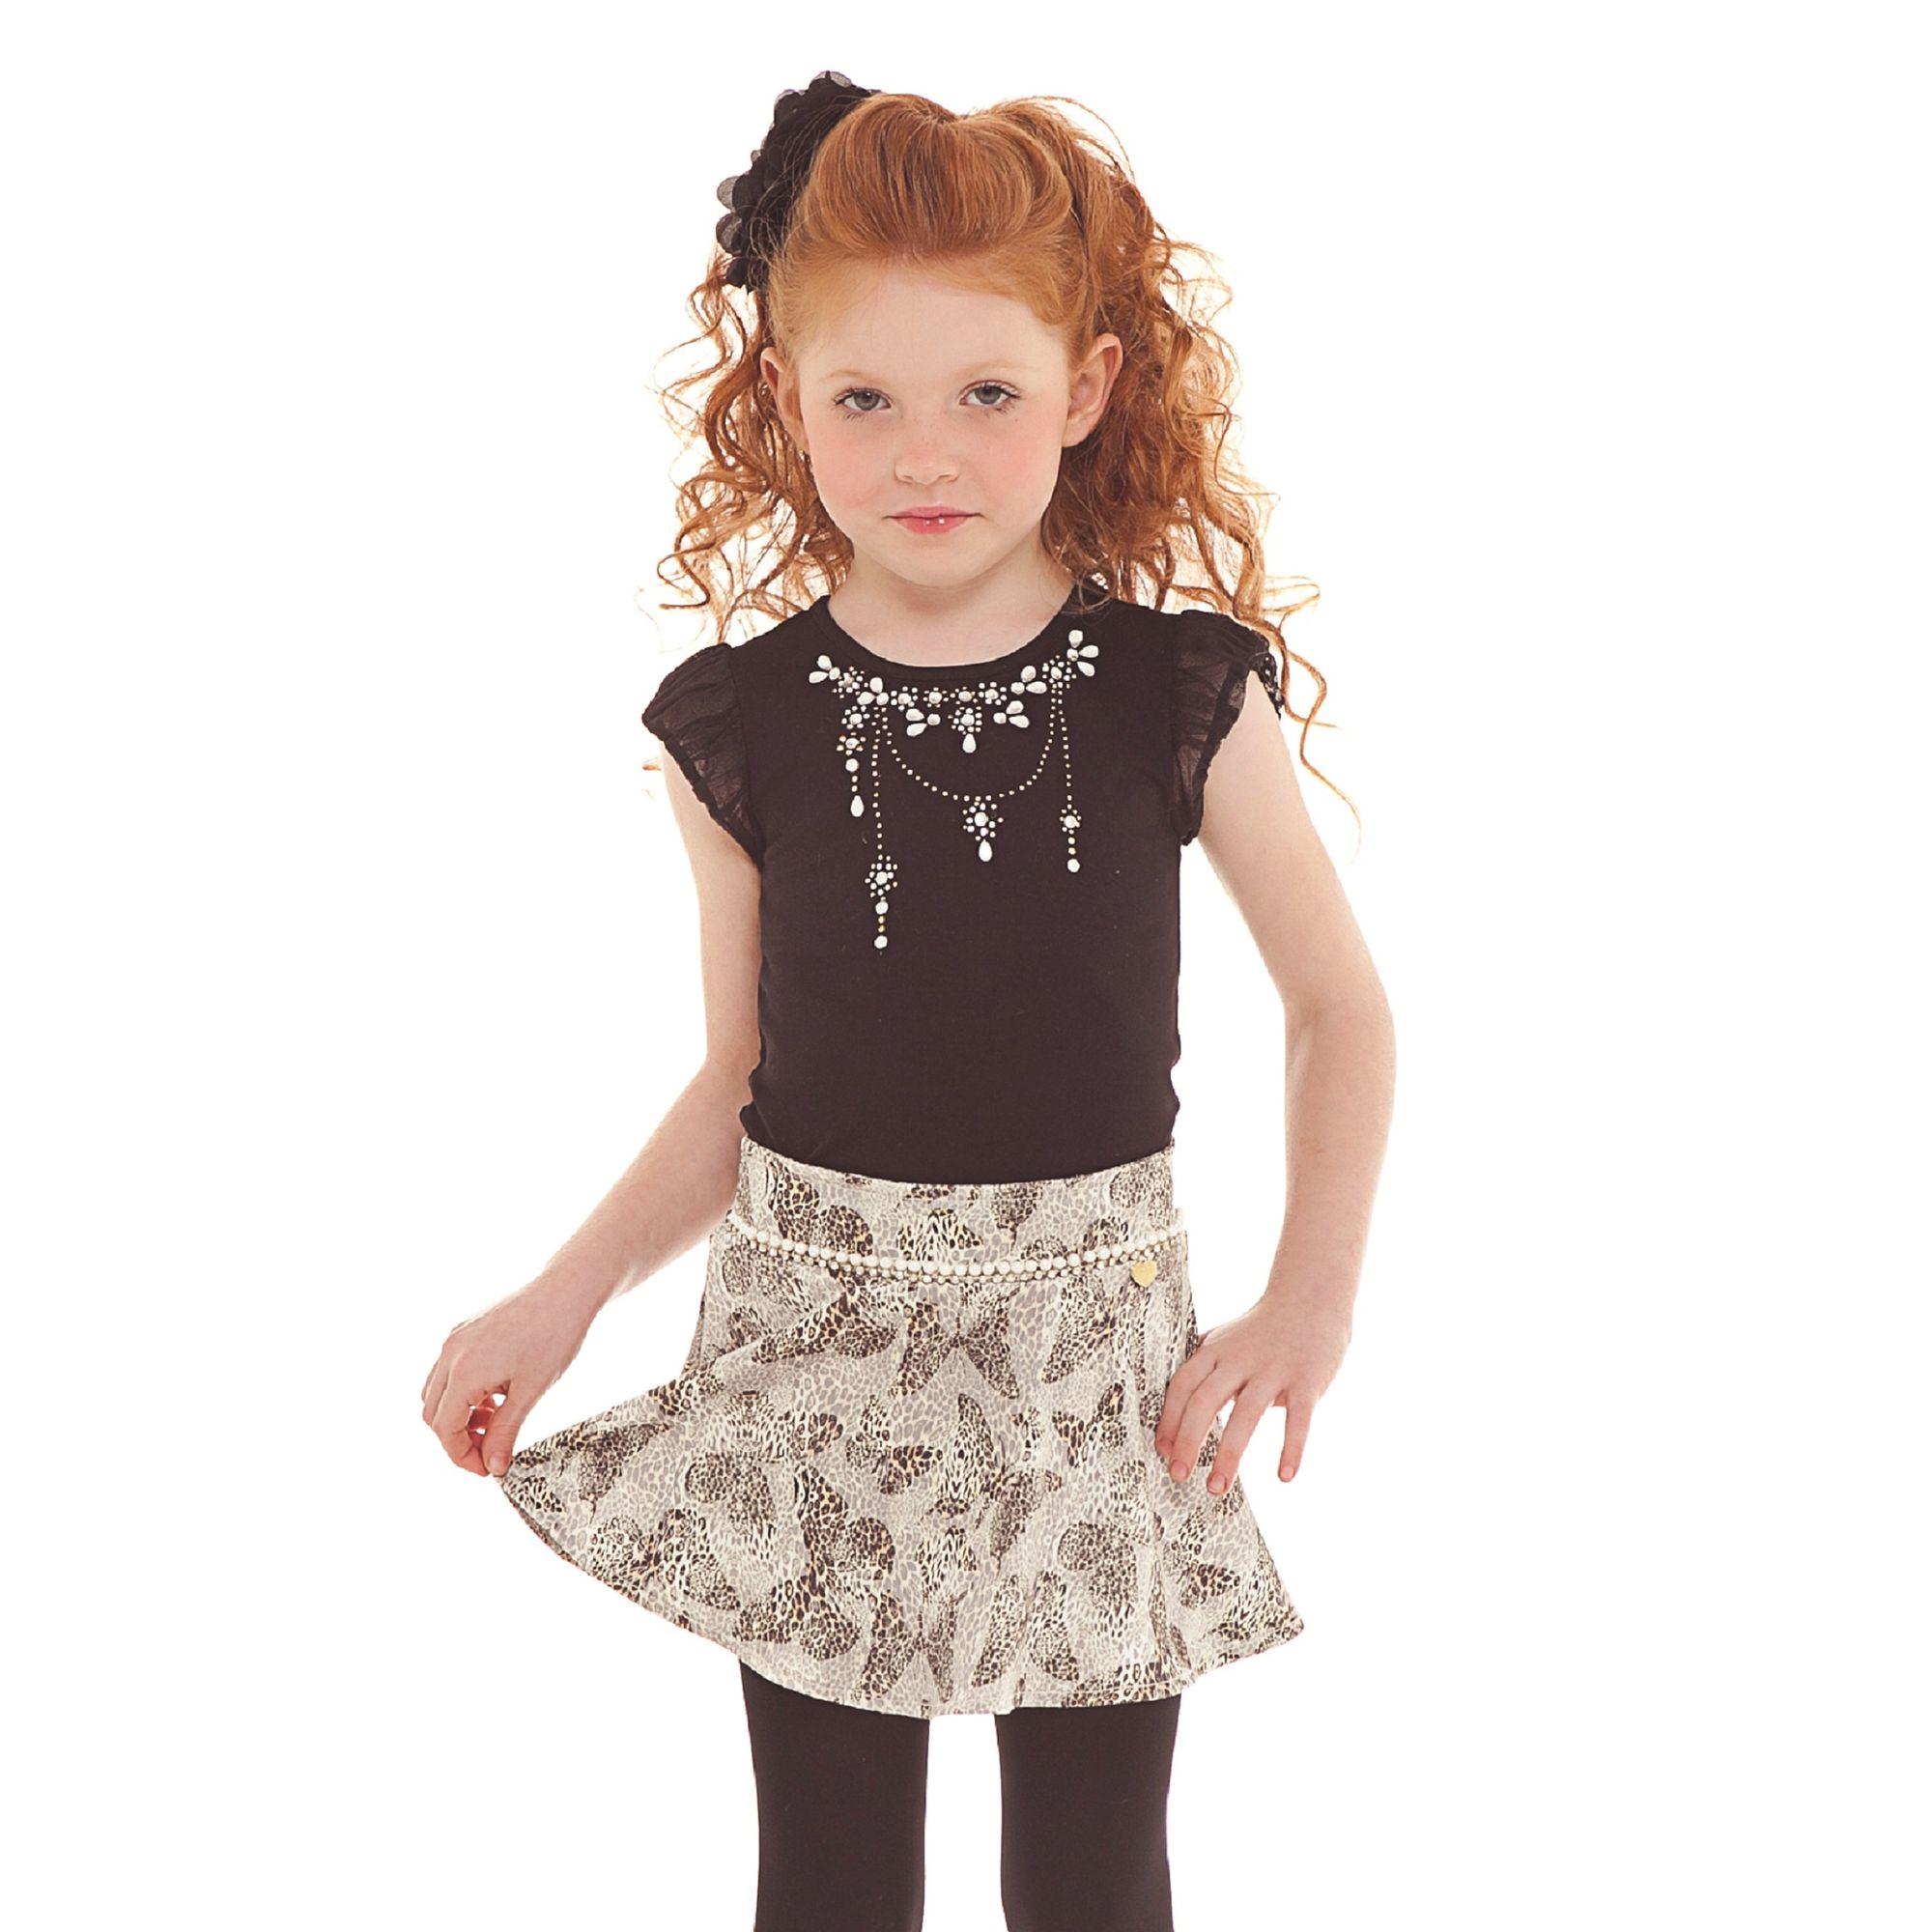 conjunto-menina-camiseta-cristais-e-saia-borboletas-infantil